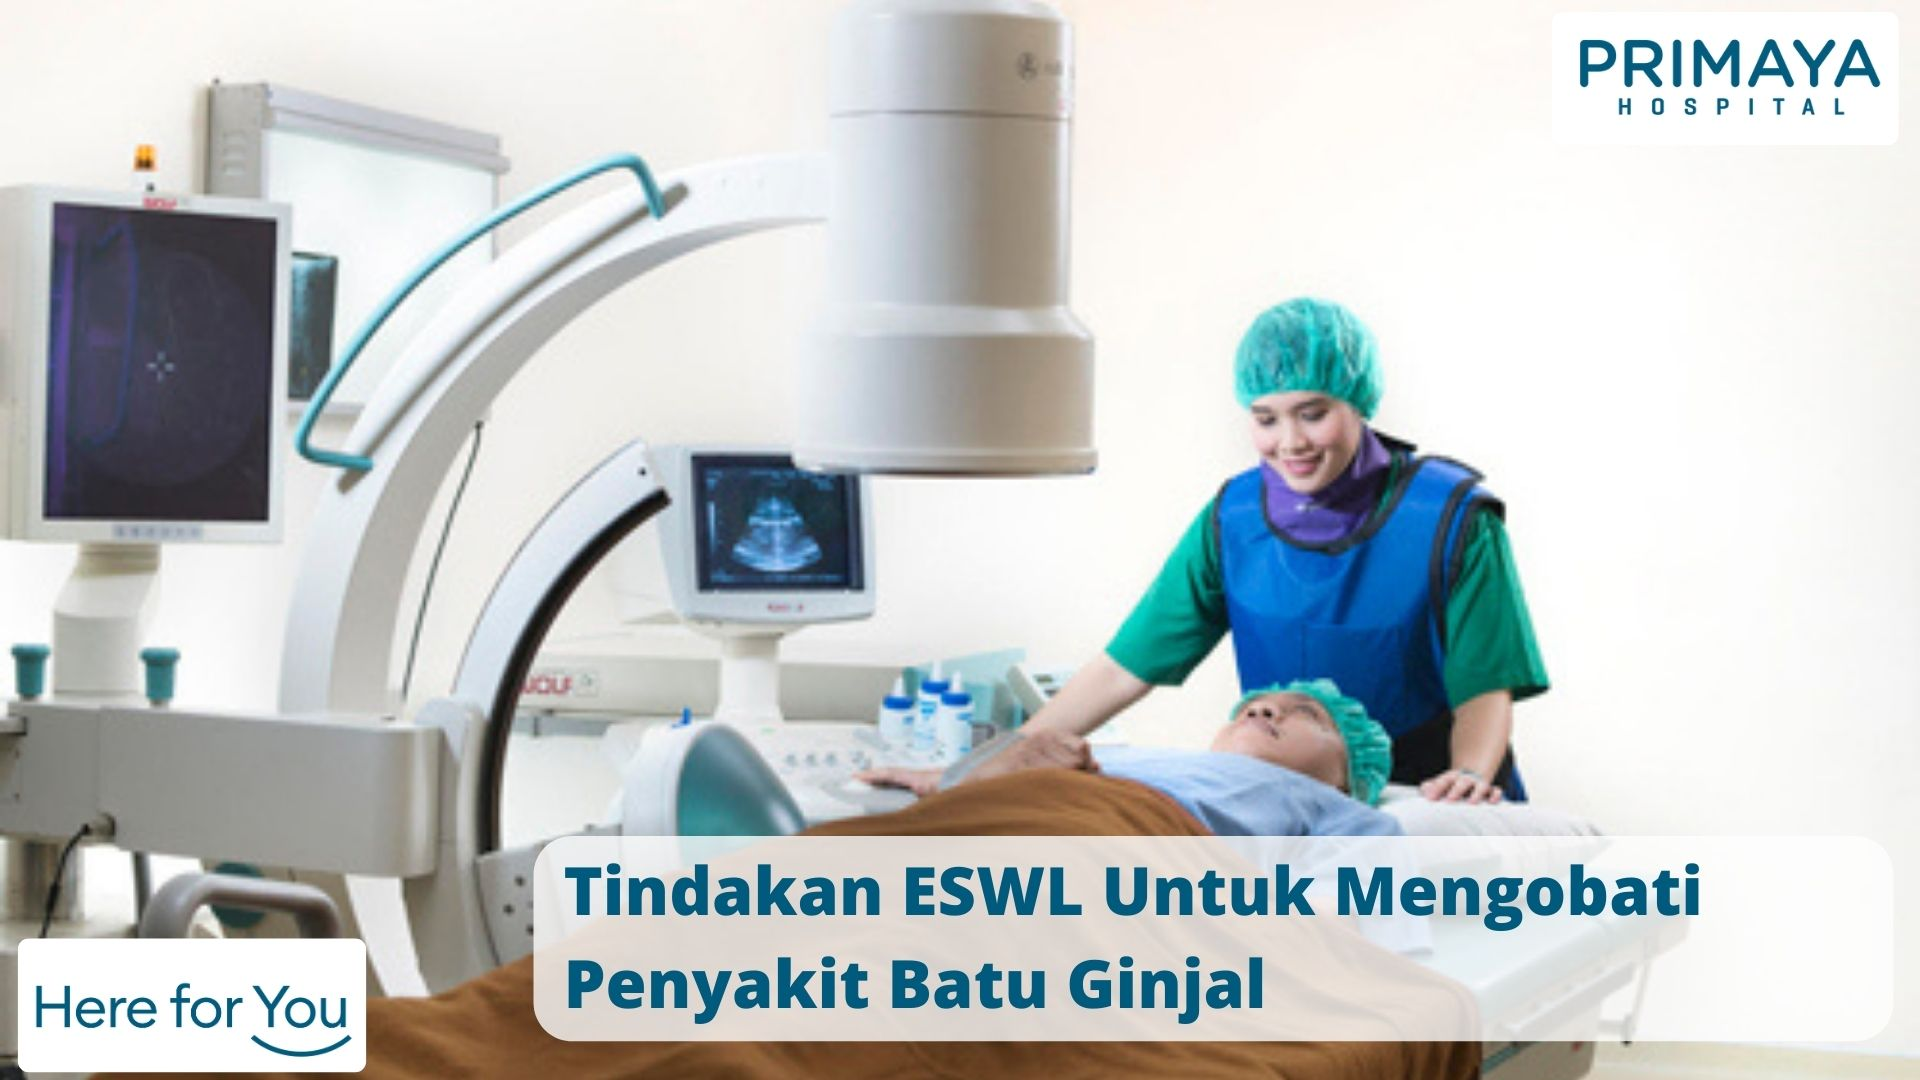 Tindakan ESWL Untuk Mengobati Penyakit Batu Ginjal